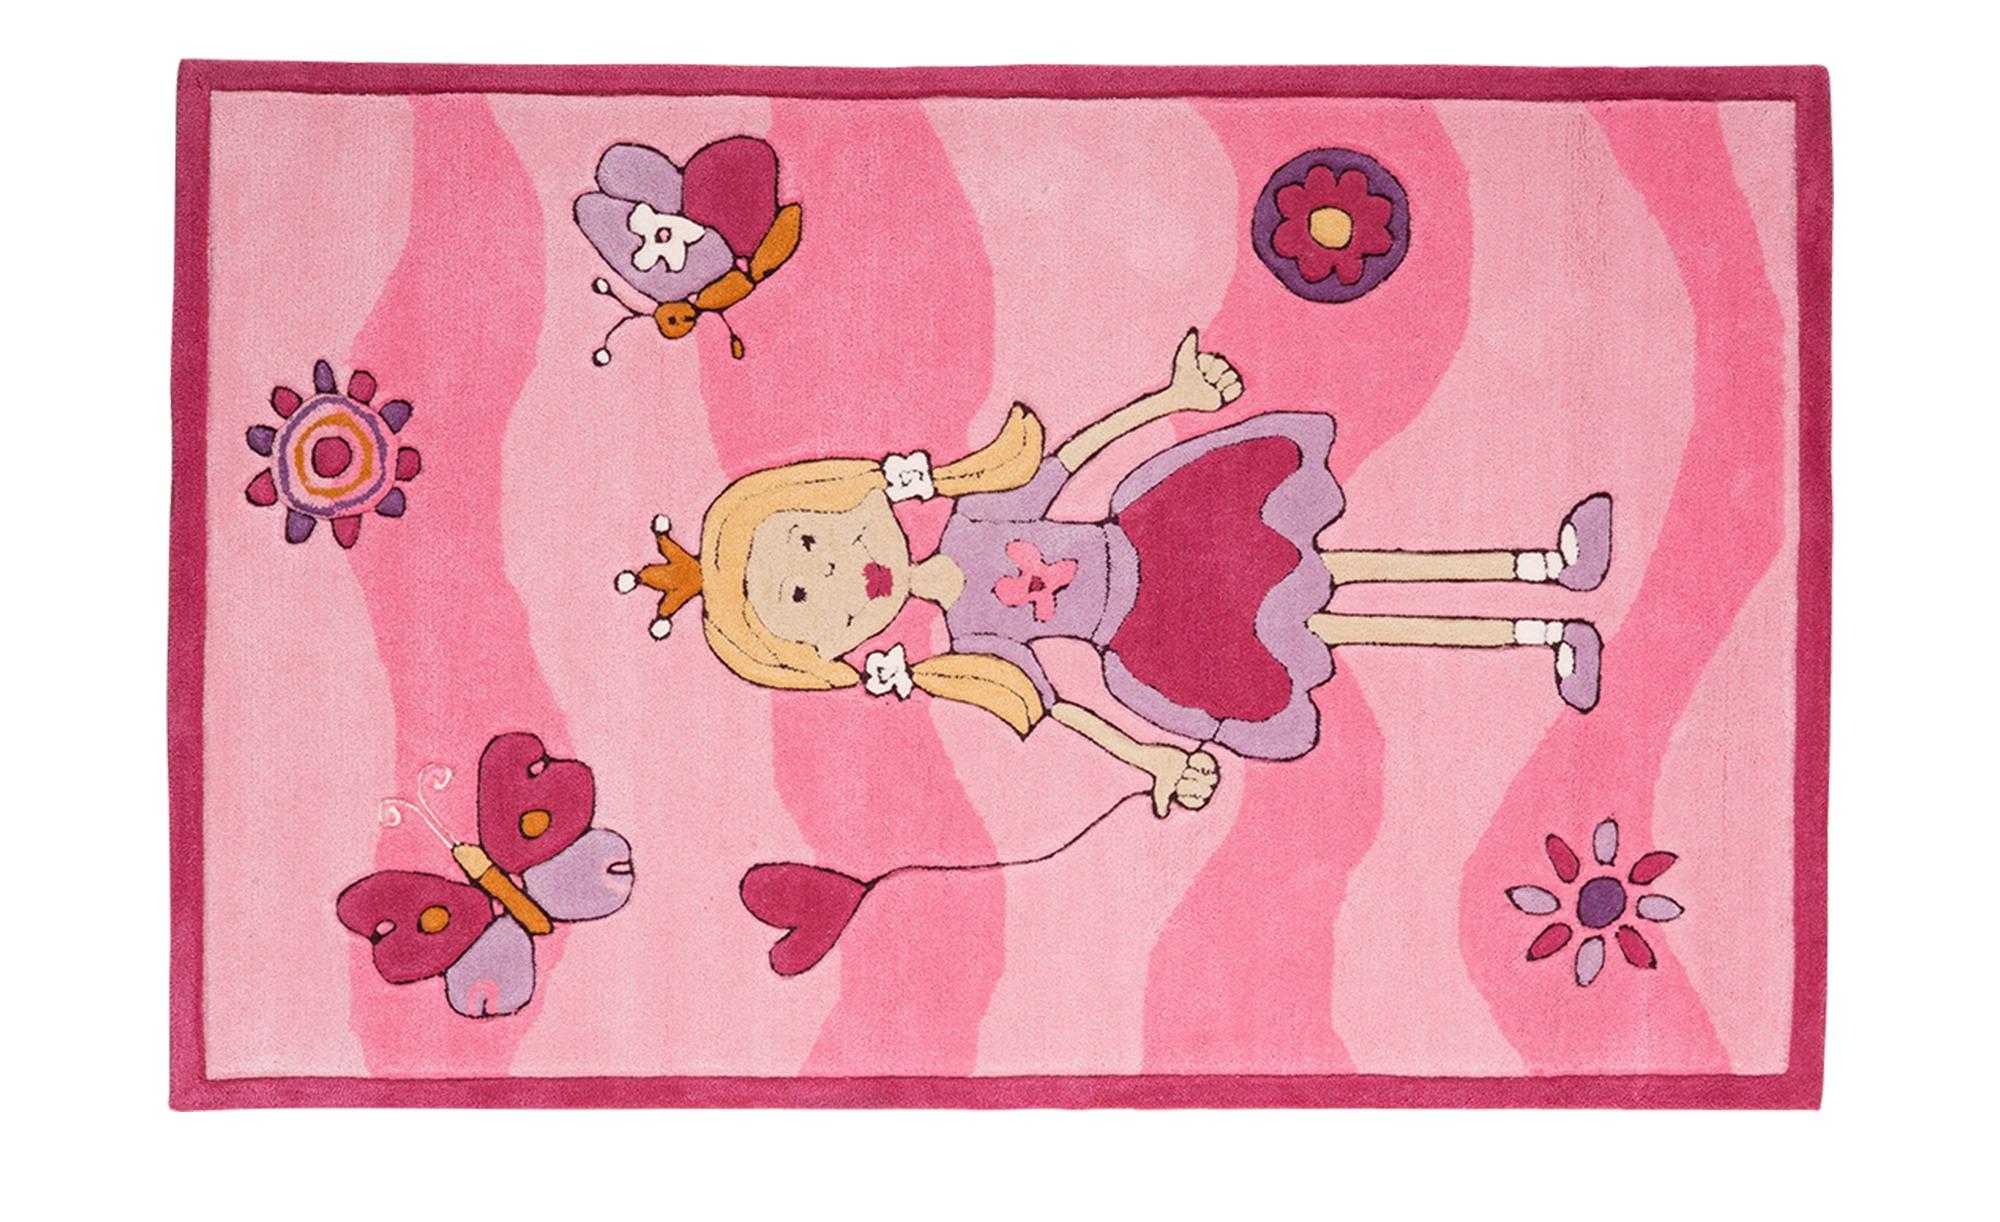 Handtuft Teppich Maui Breite 120 Cm H 246 He Rosa Pink